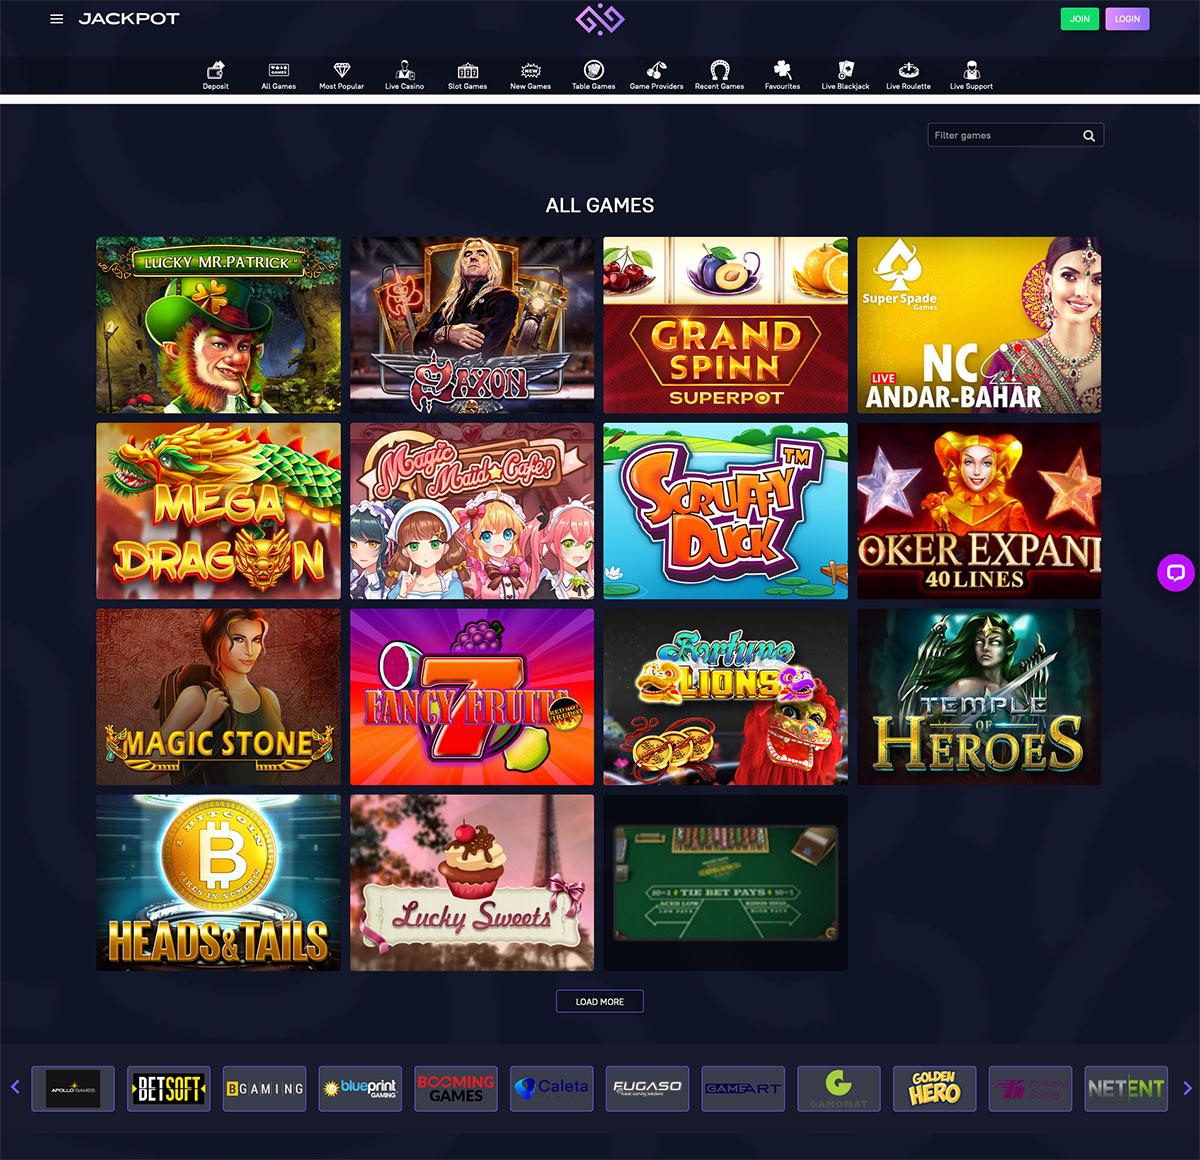 Jackpot casino games